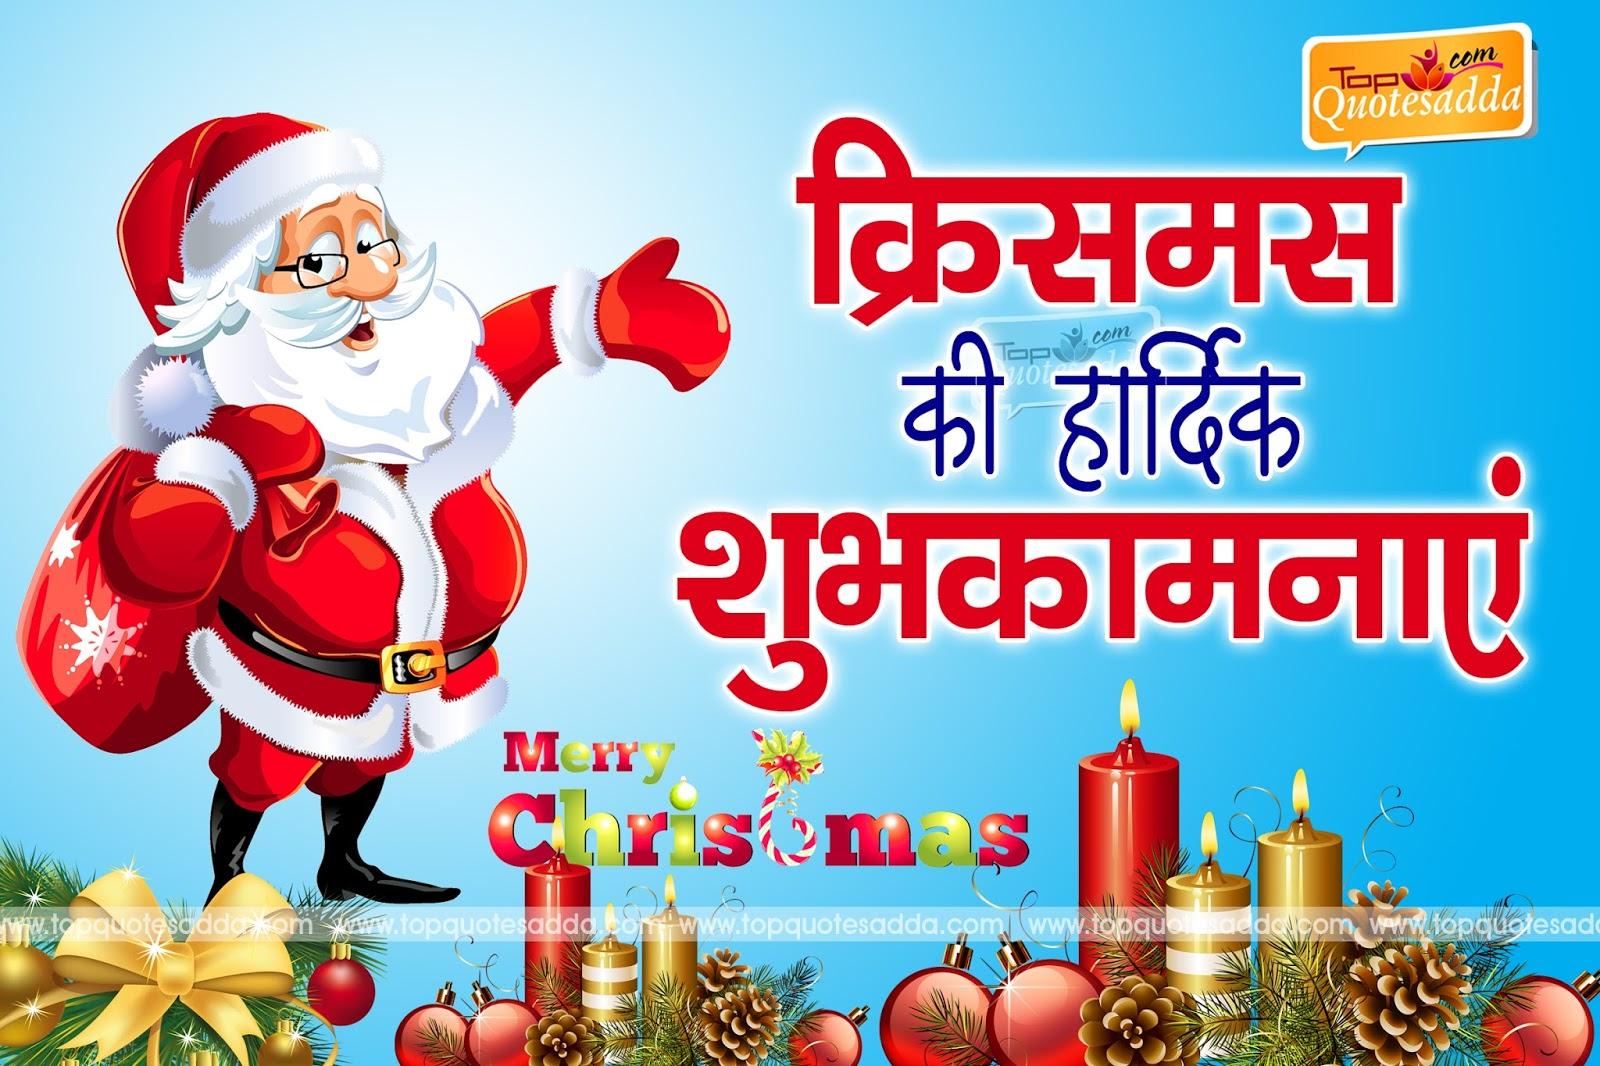 Happy Christmas Hindi Quotes Hq Images For Facebook Topquotesadda